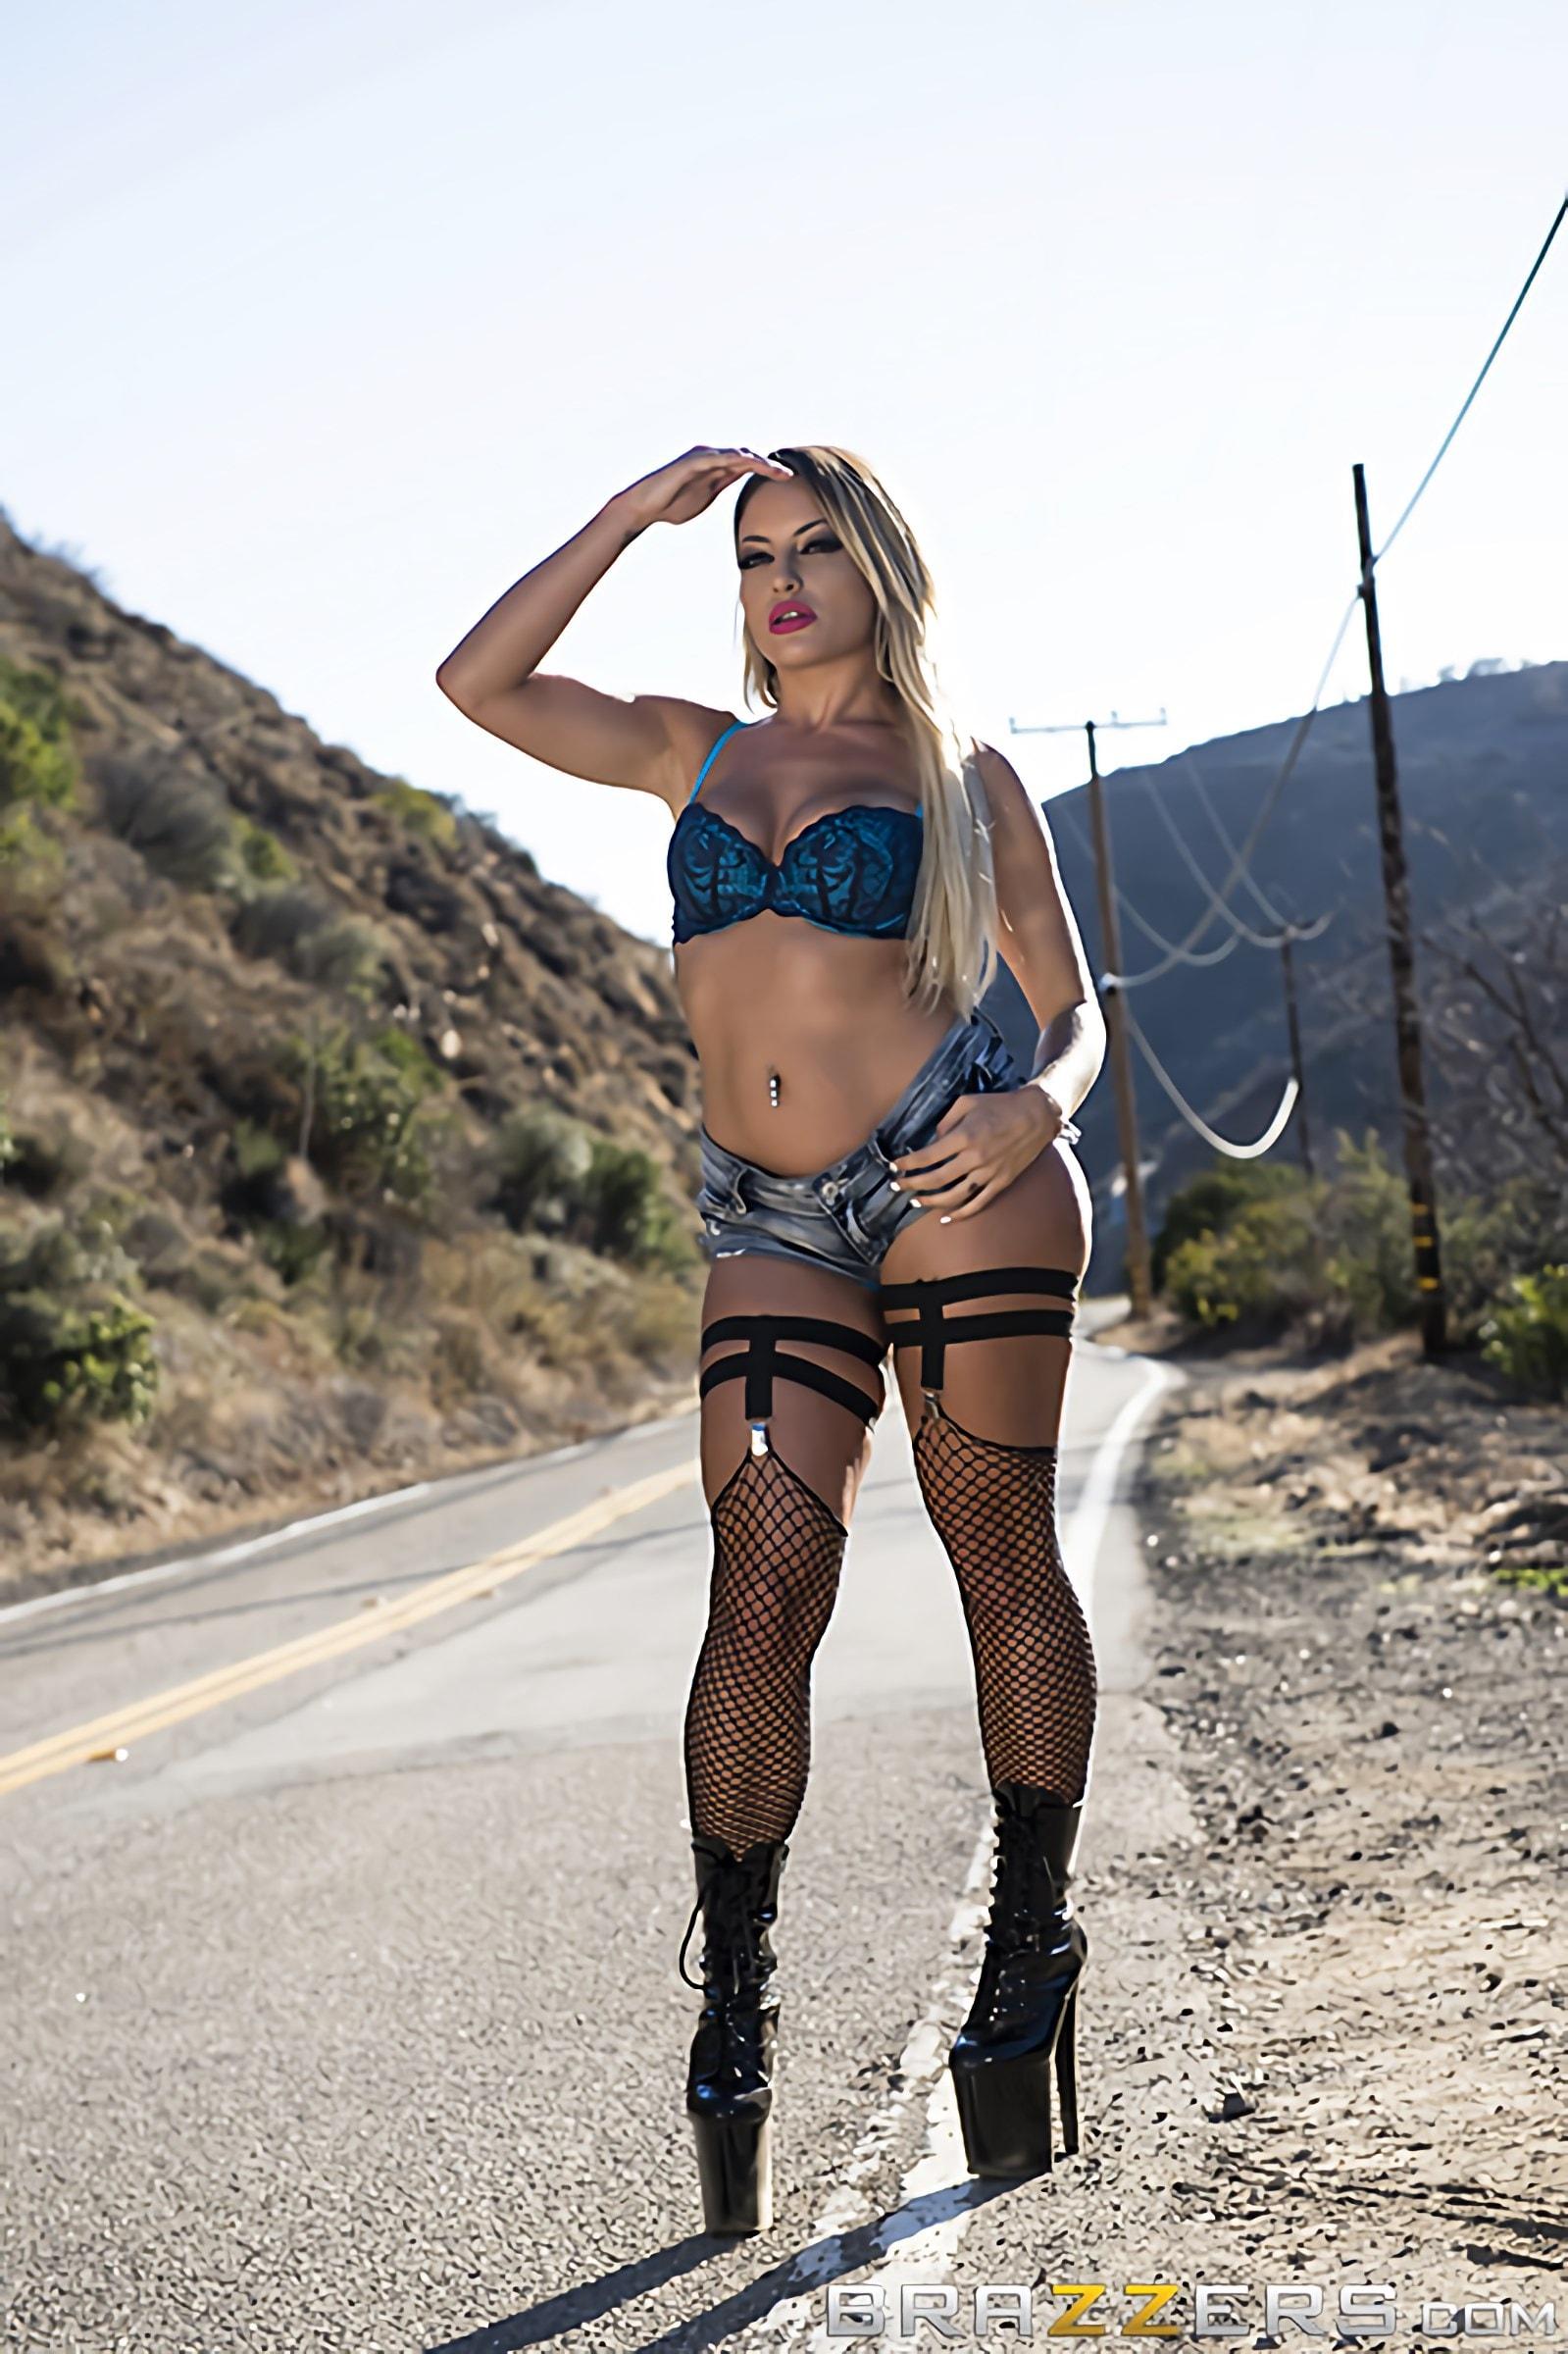 Brazzers 'Arrest This Whore' starring Kissa Sins (Photo 12)